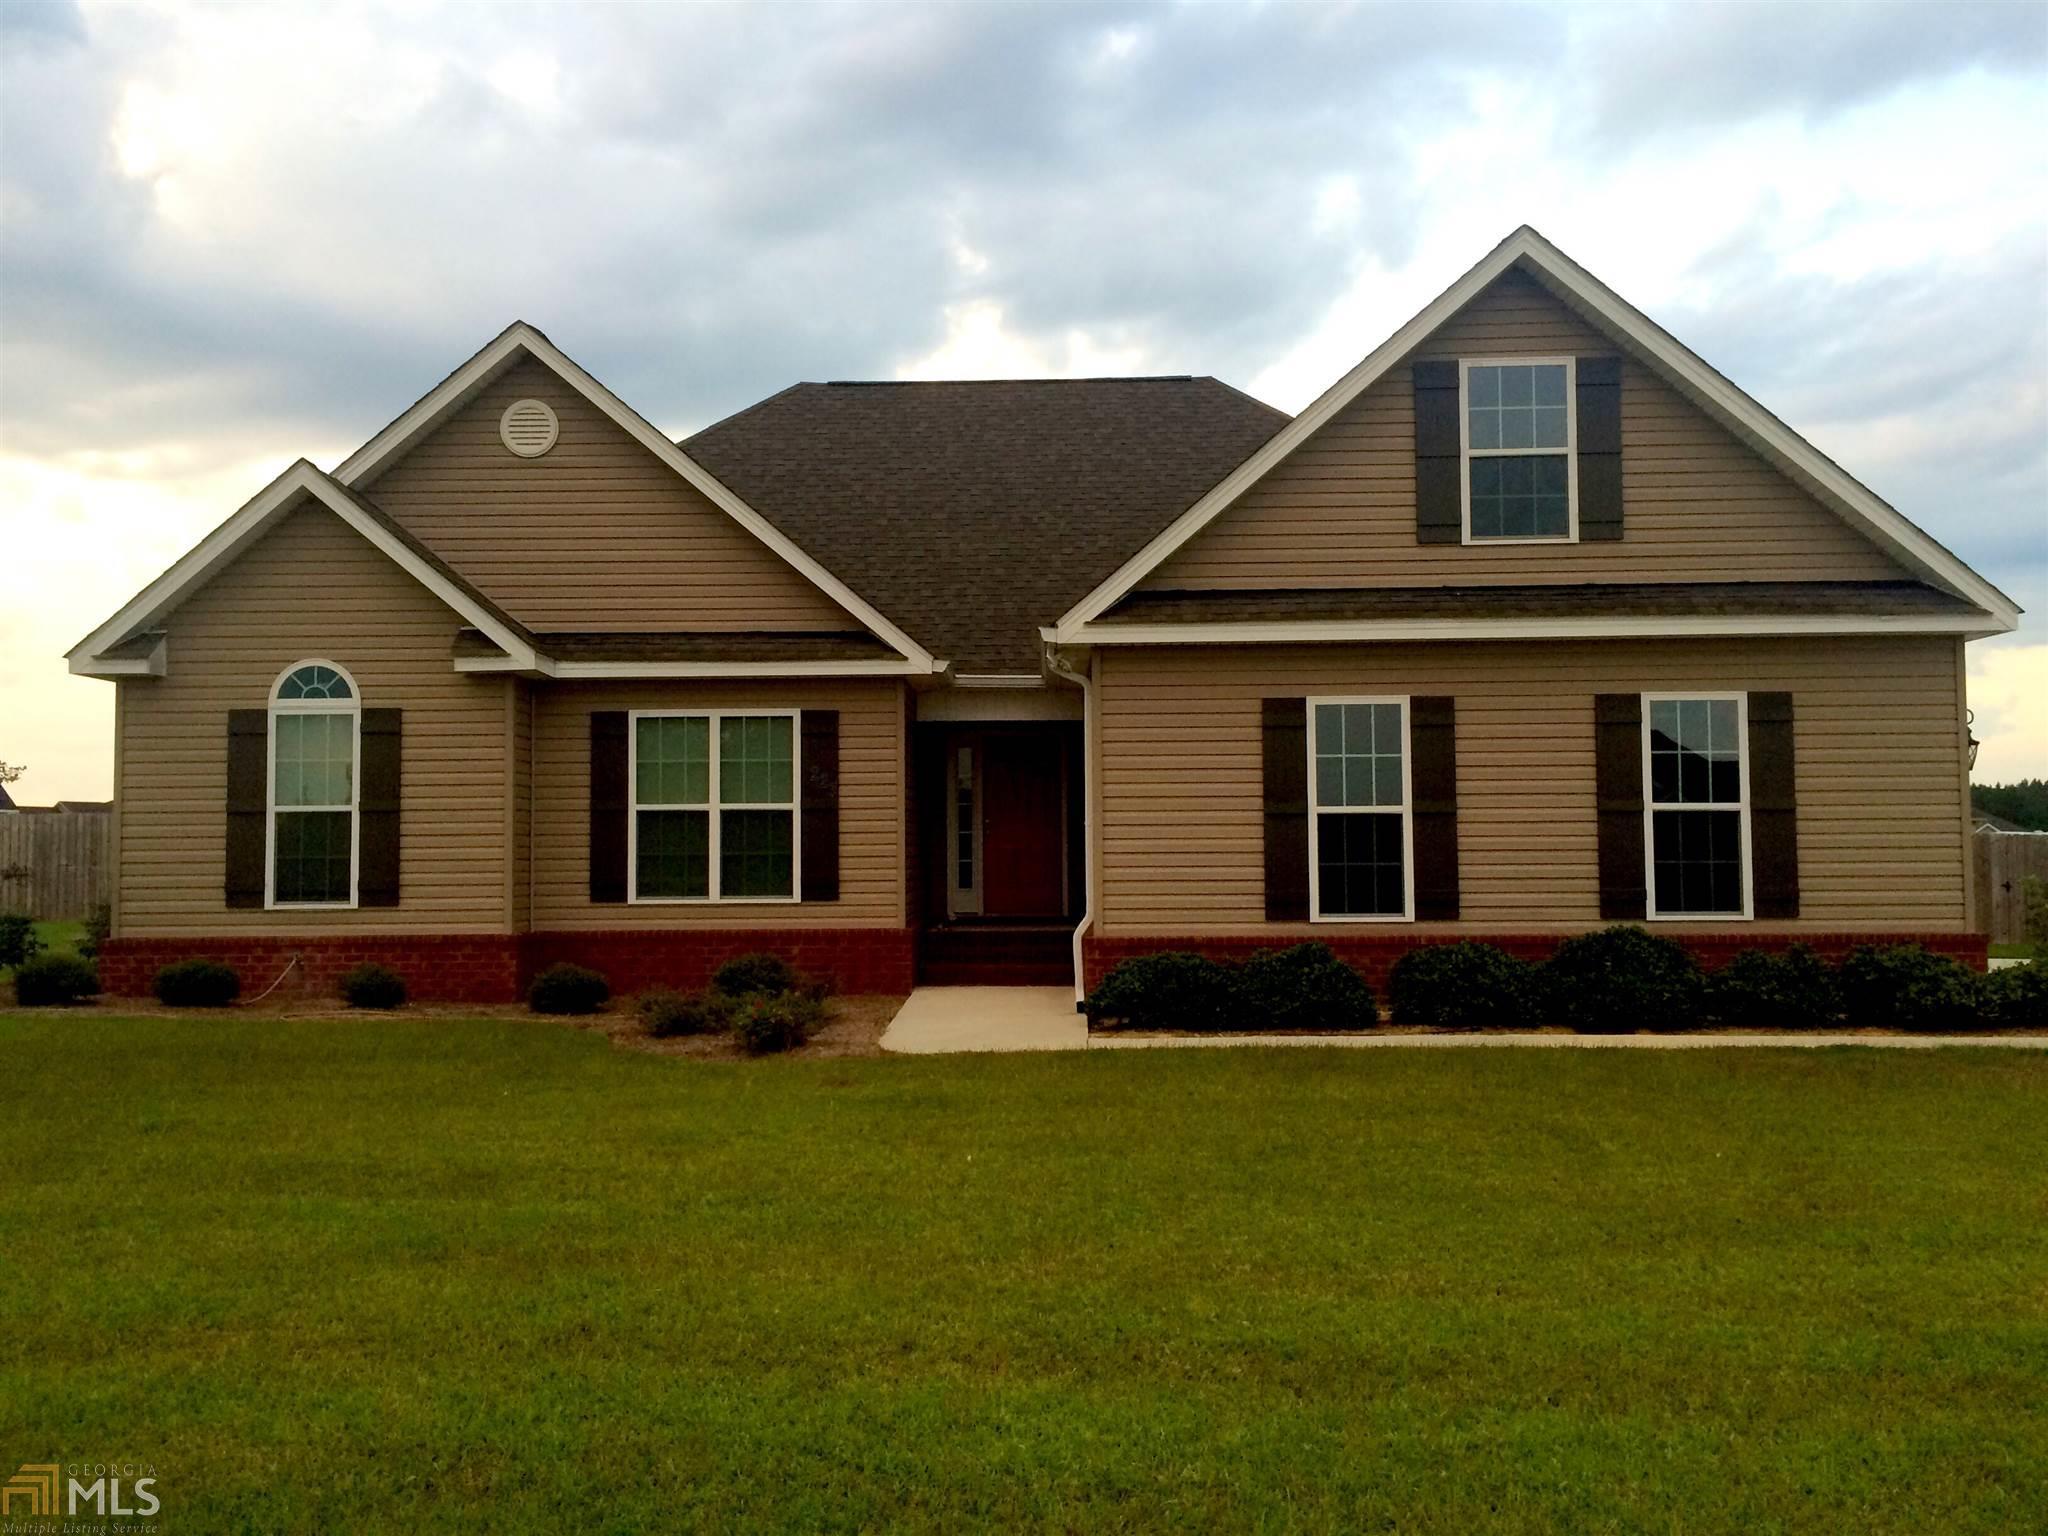 223 Canterberry Place, Statesboro, GA 30458